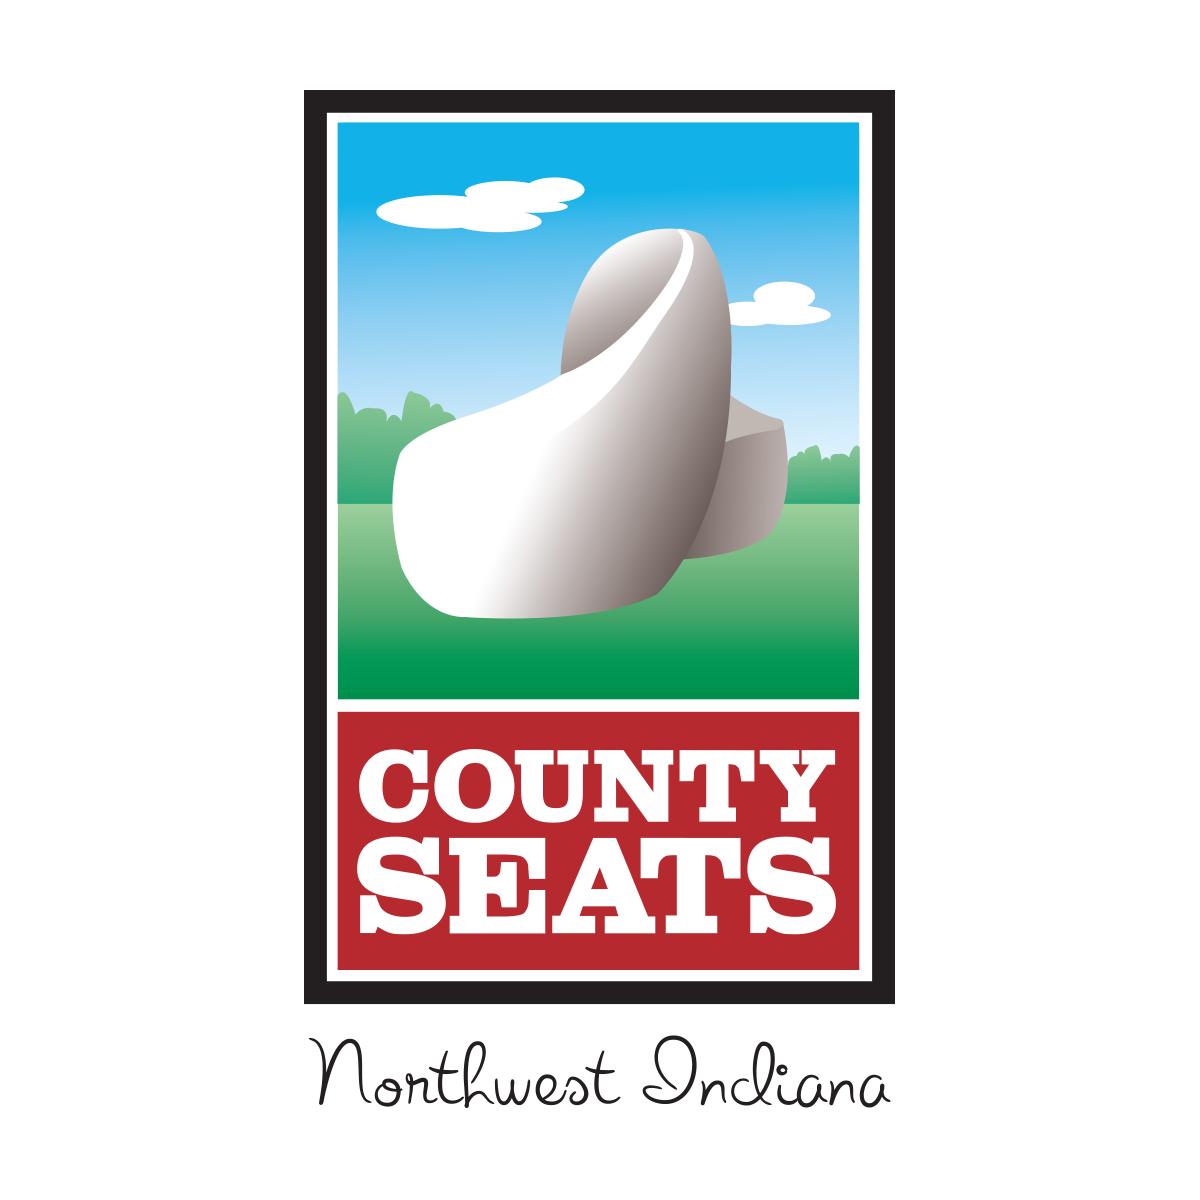 County Seats, Public Art Project